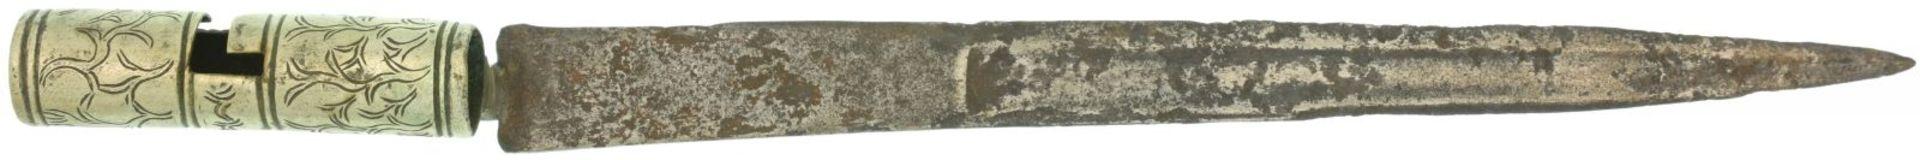 Tüllenbajonett, jagdlich, 18. Jahrhundert KL 320mm, TL 420mm, Klinge mit beidseitigem Hohlschliff,